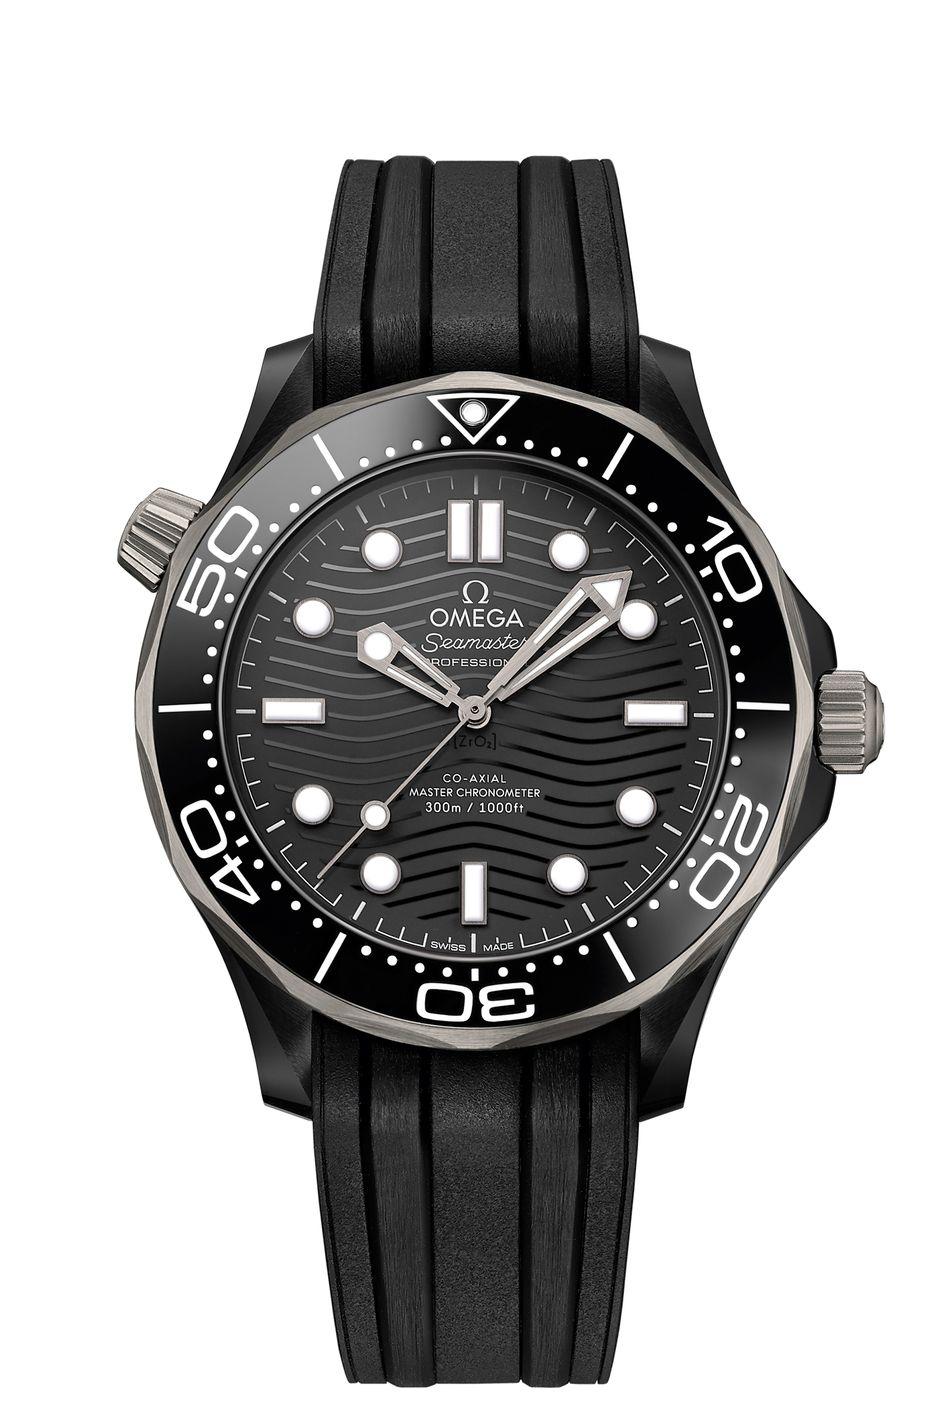 Seamaster Diver 300m